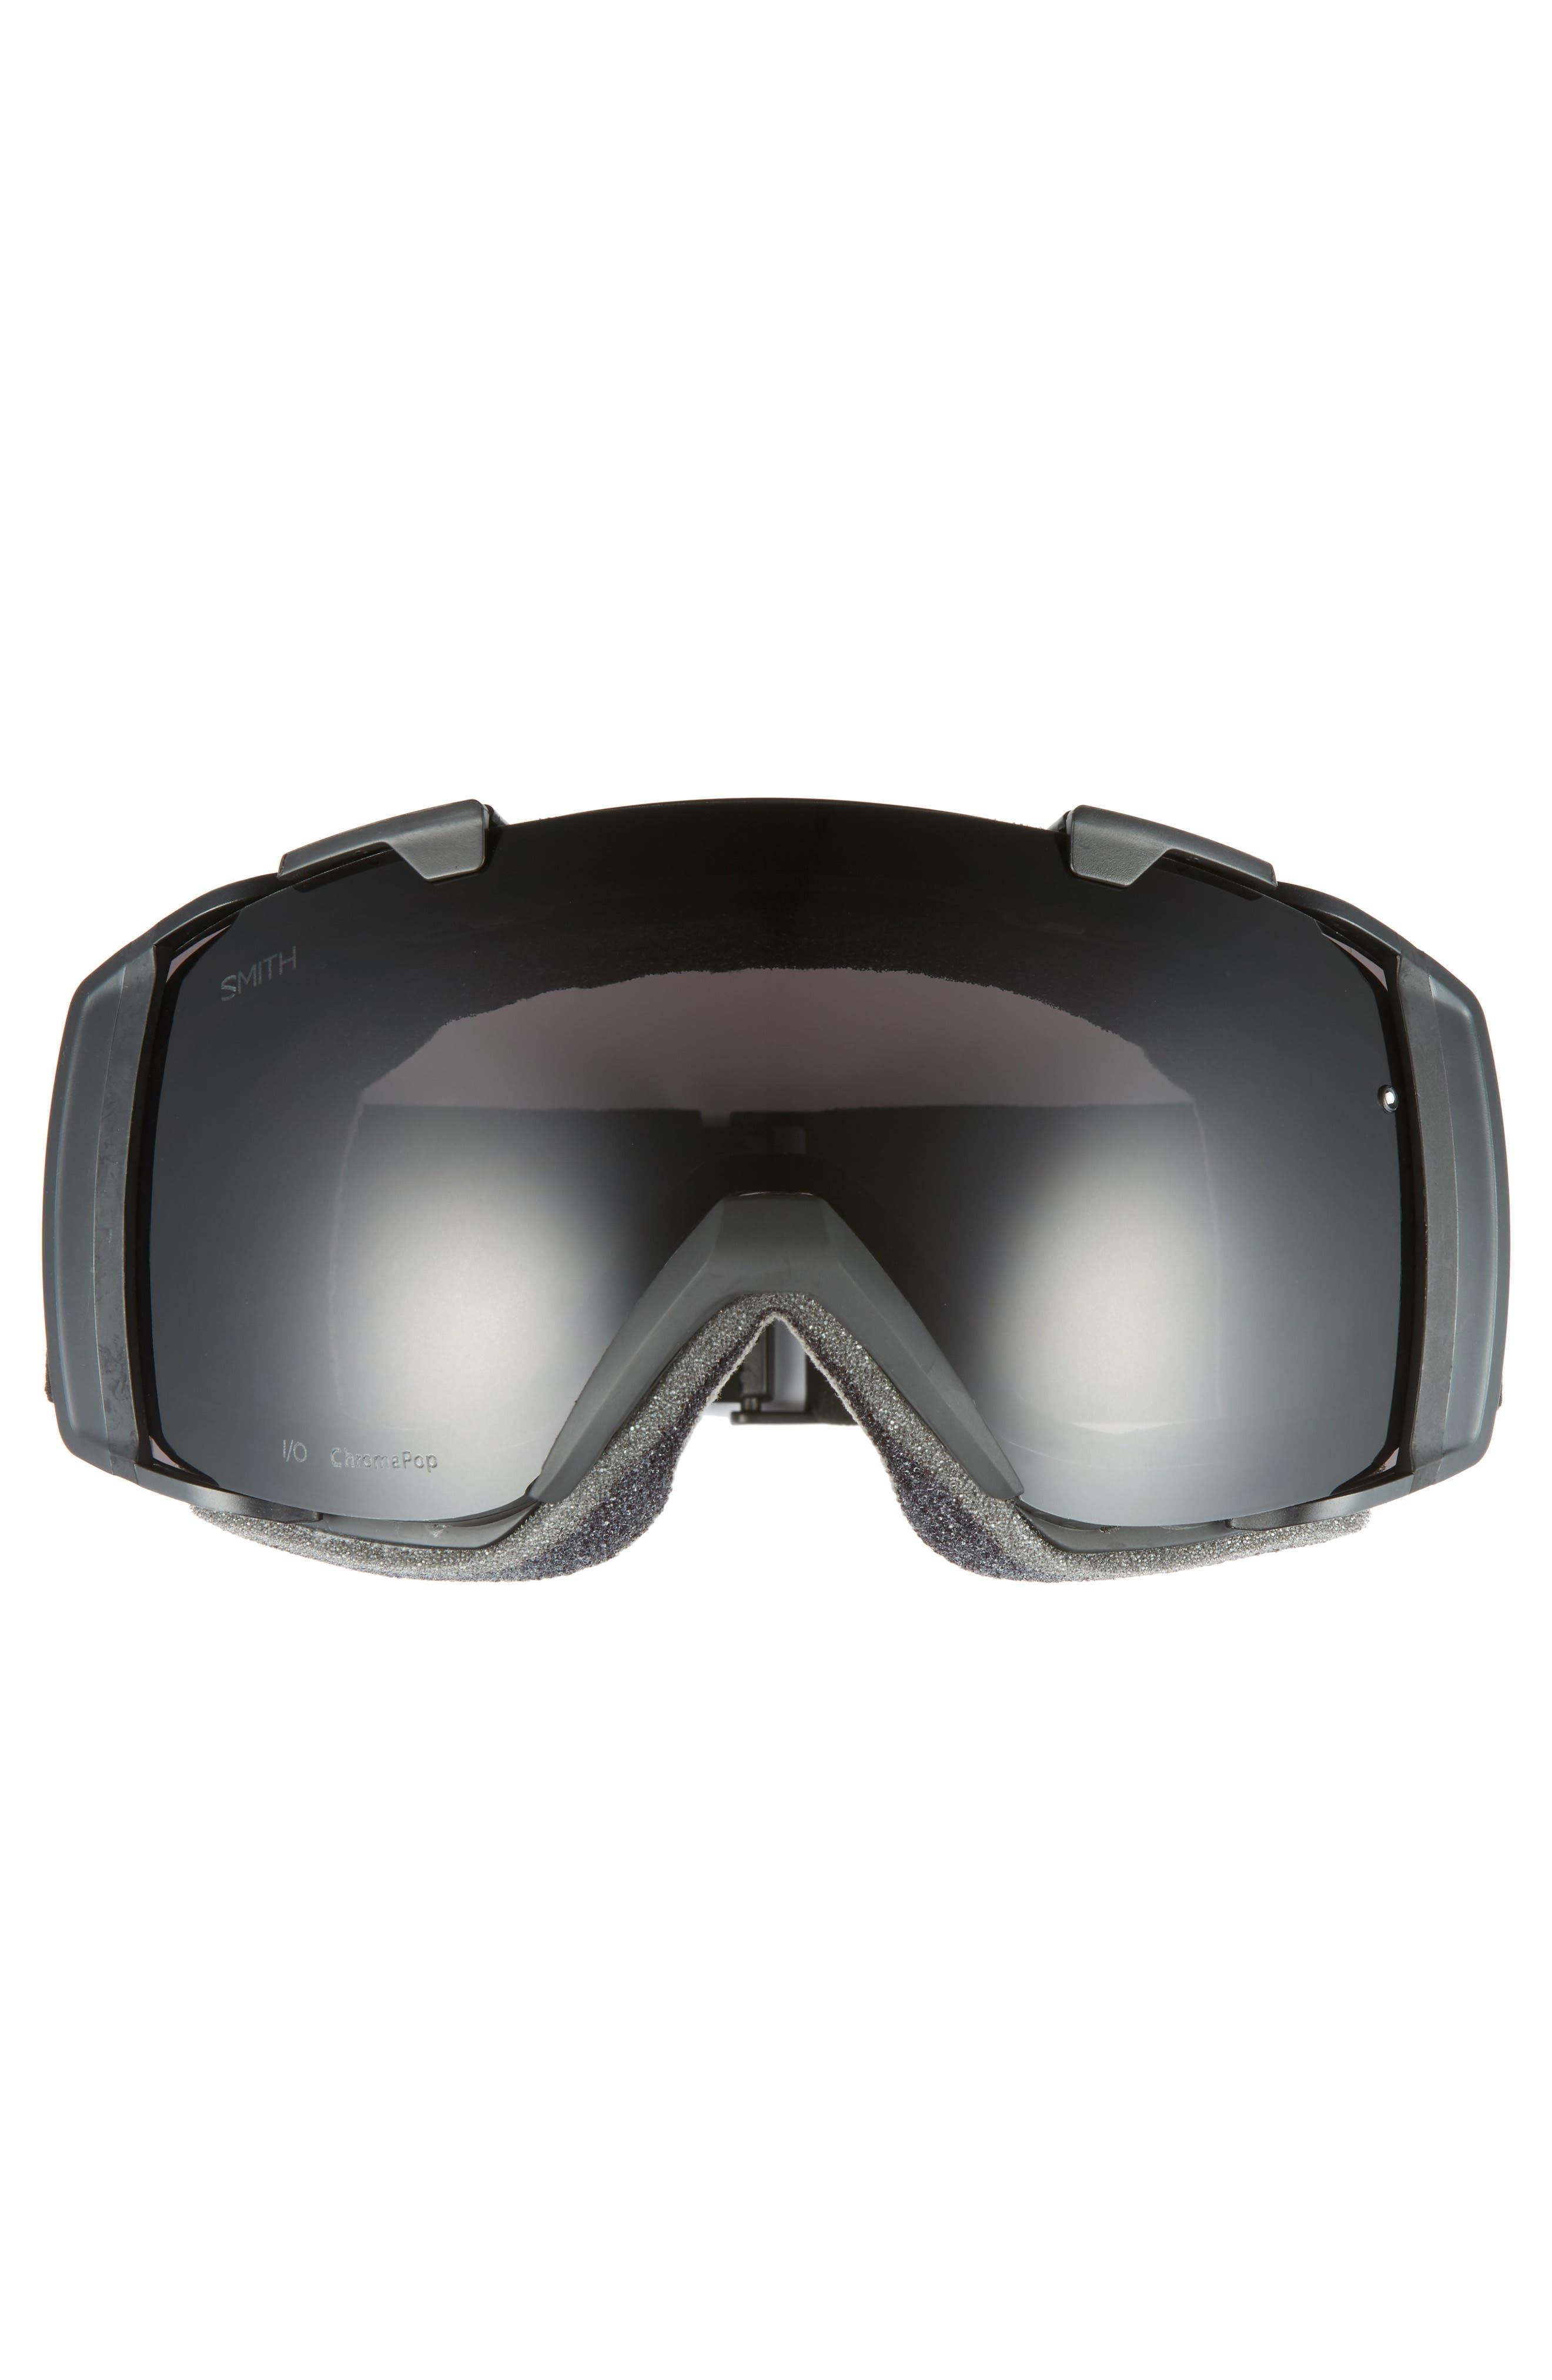 I/O 185mm Snow/Ski Goggles,                             Alternate thumbnail 3, color,                             BLACKOUT/ MIRROR